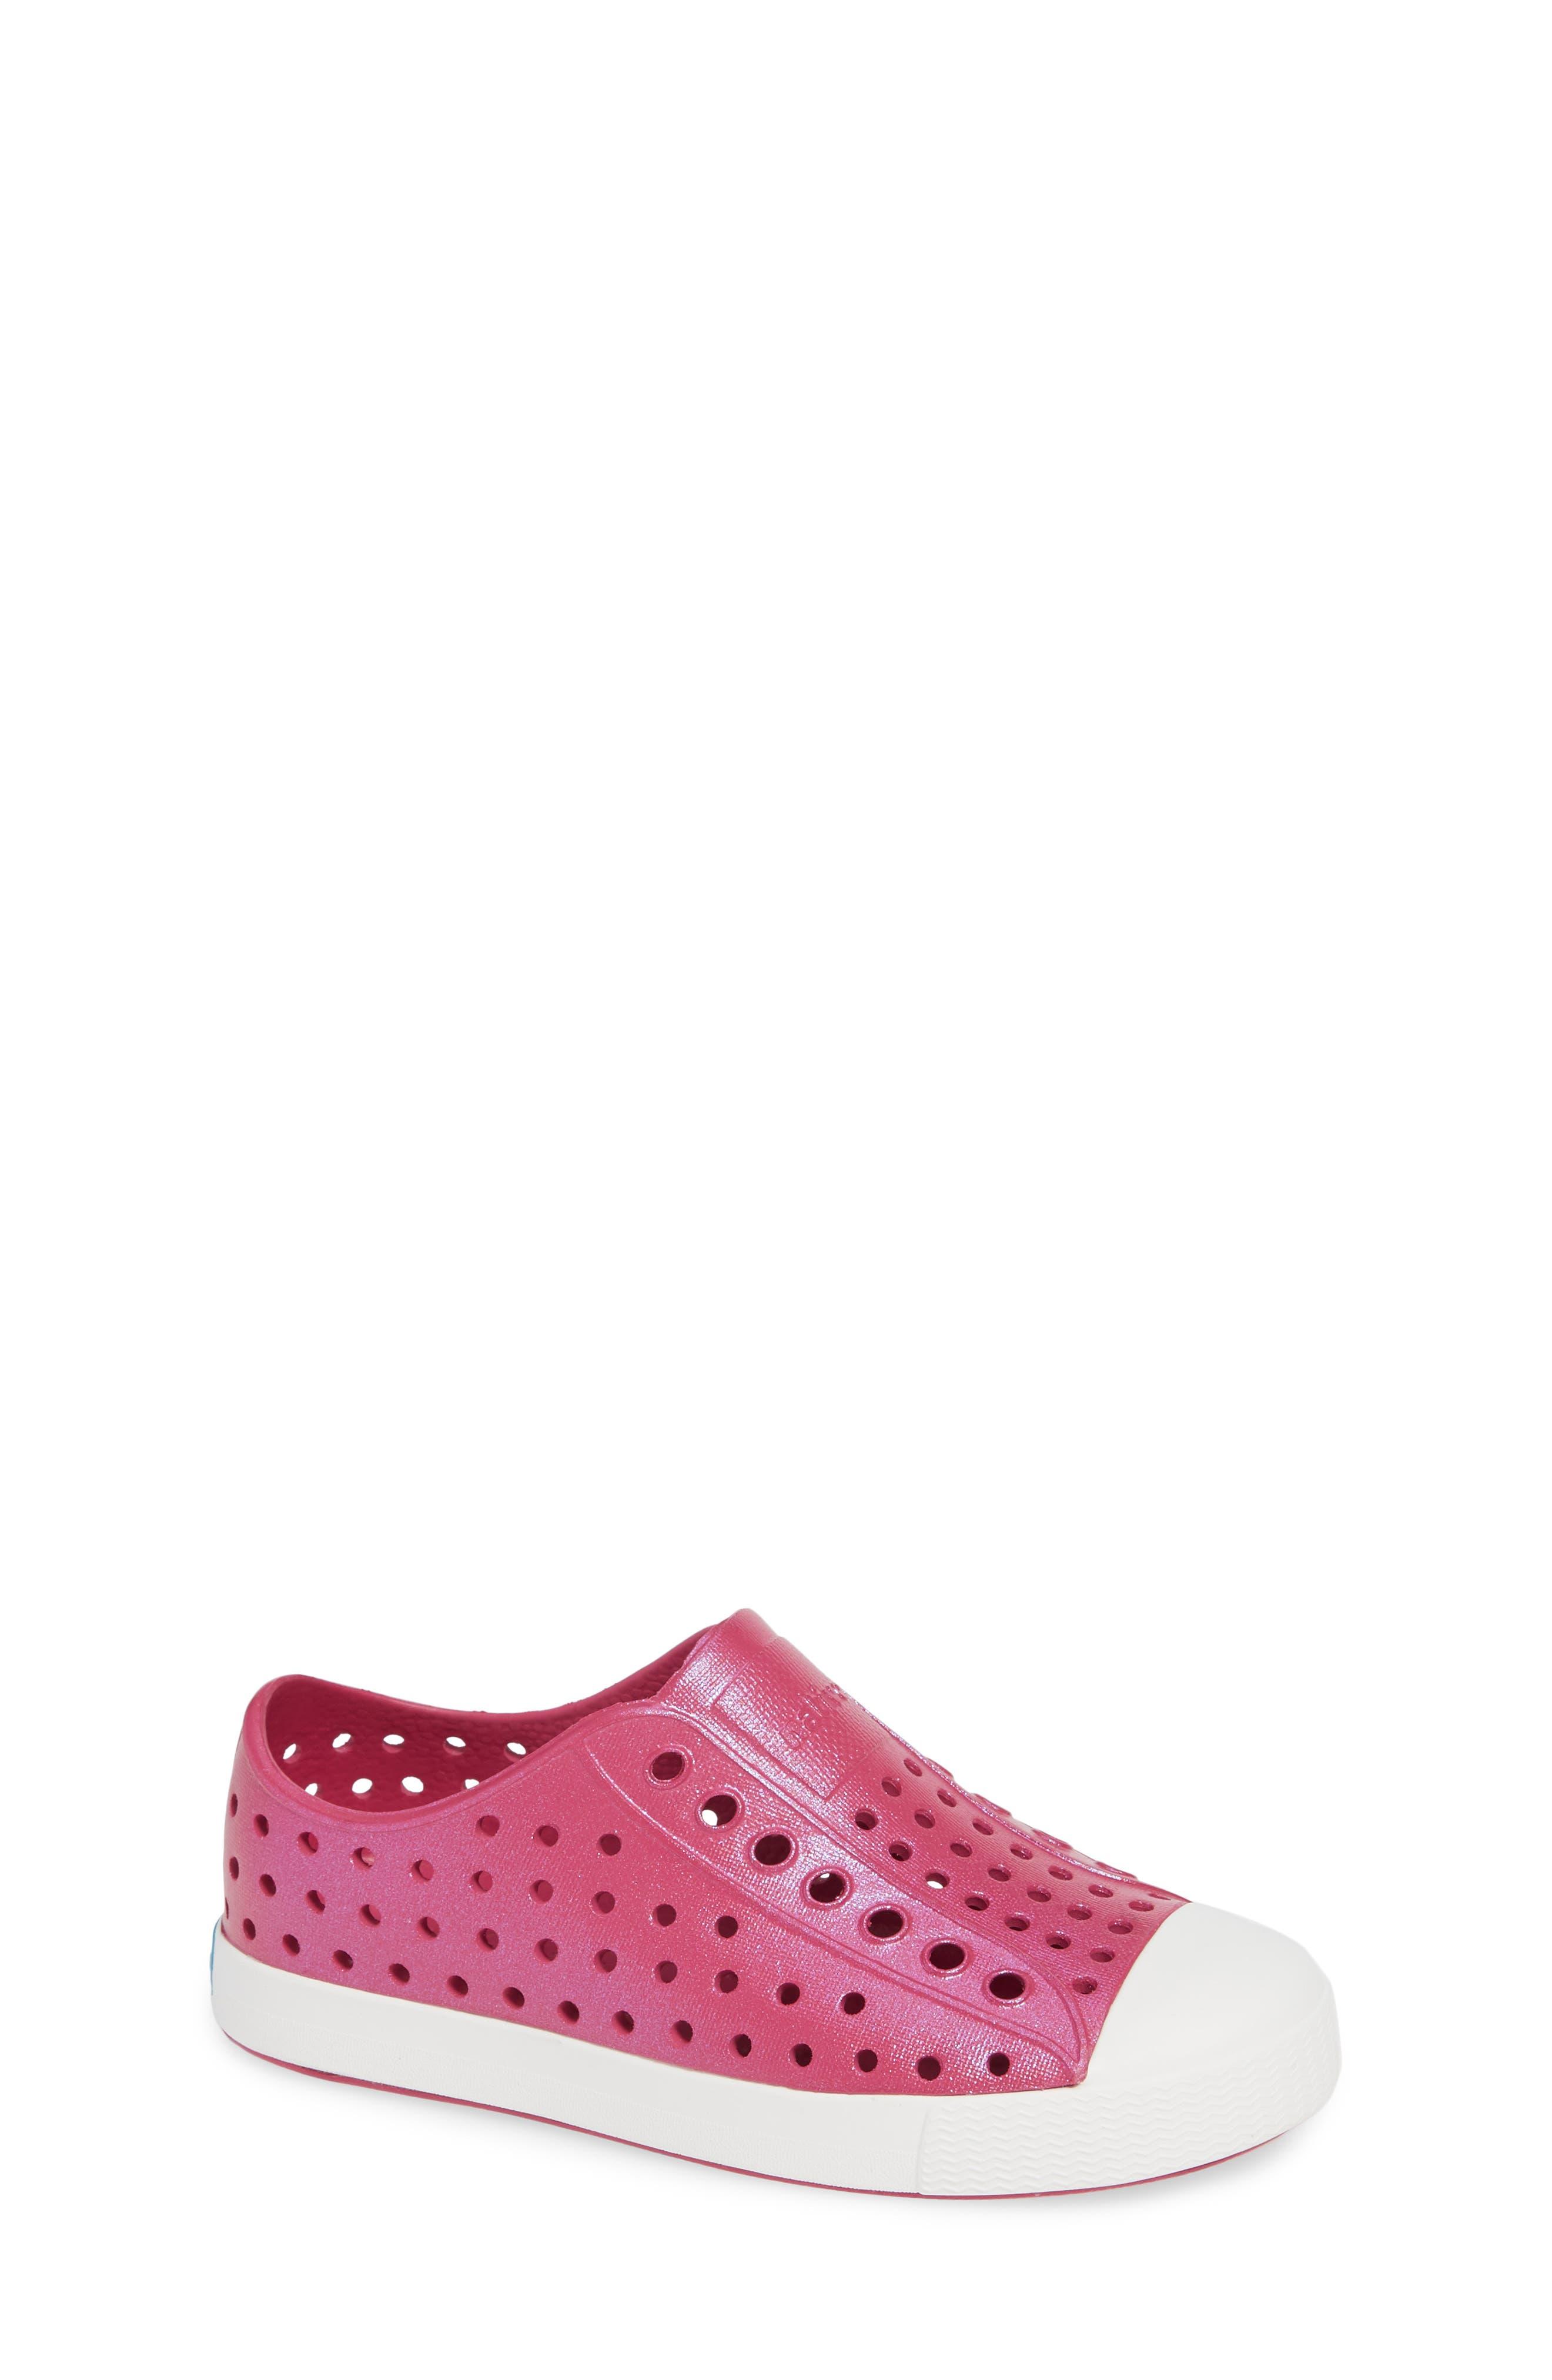 Baby Walker Toddler Native Shoes Nordstrom Mom N Bab Dress White Polkadot Size 3t